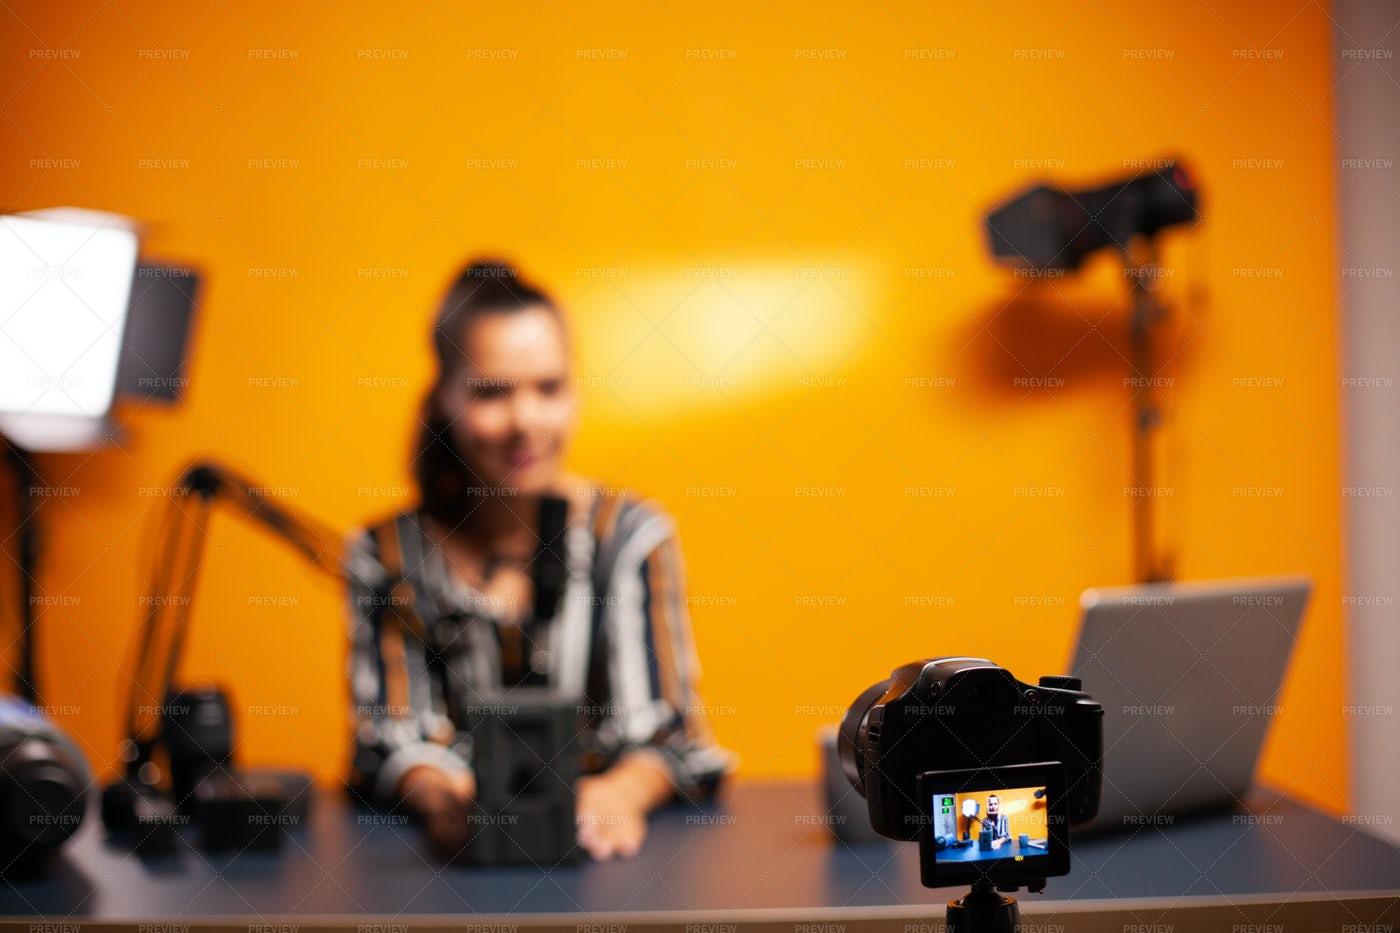 Camera Recording Vlog In Home Studio: Stock Photos